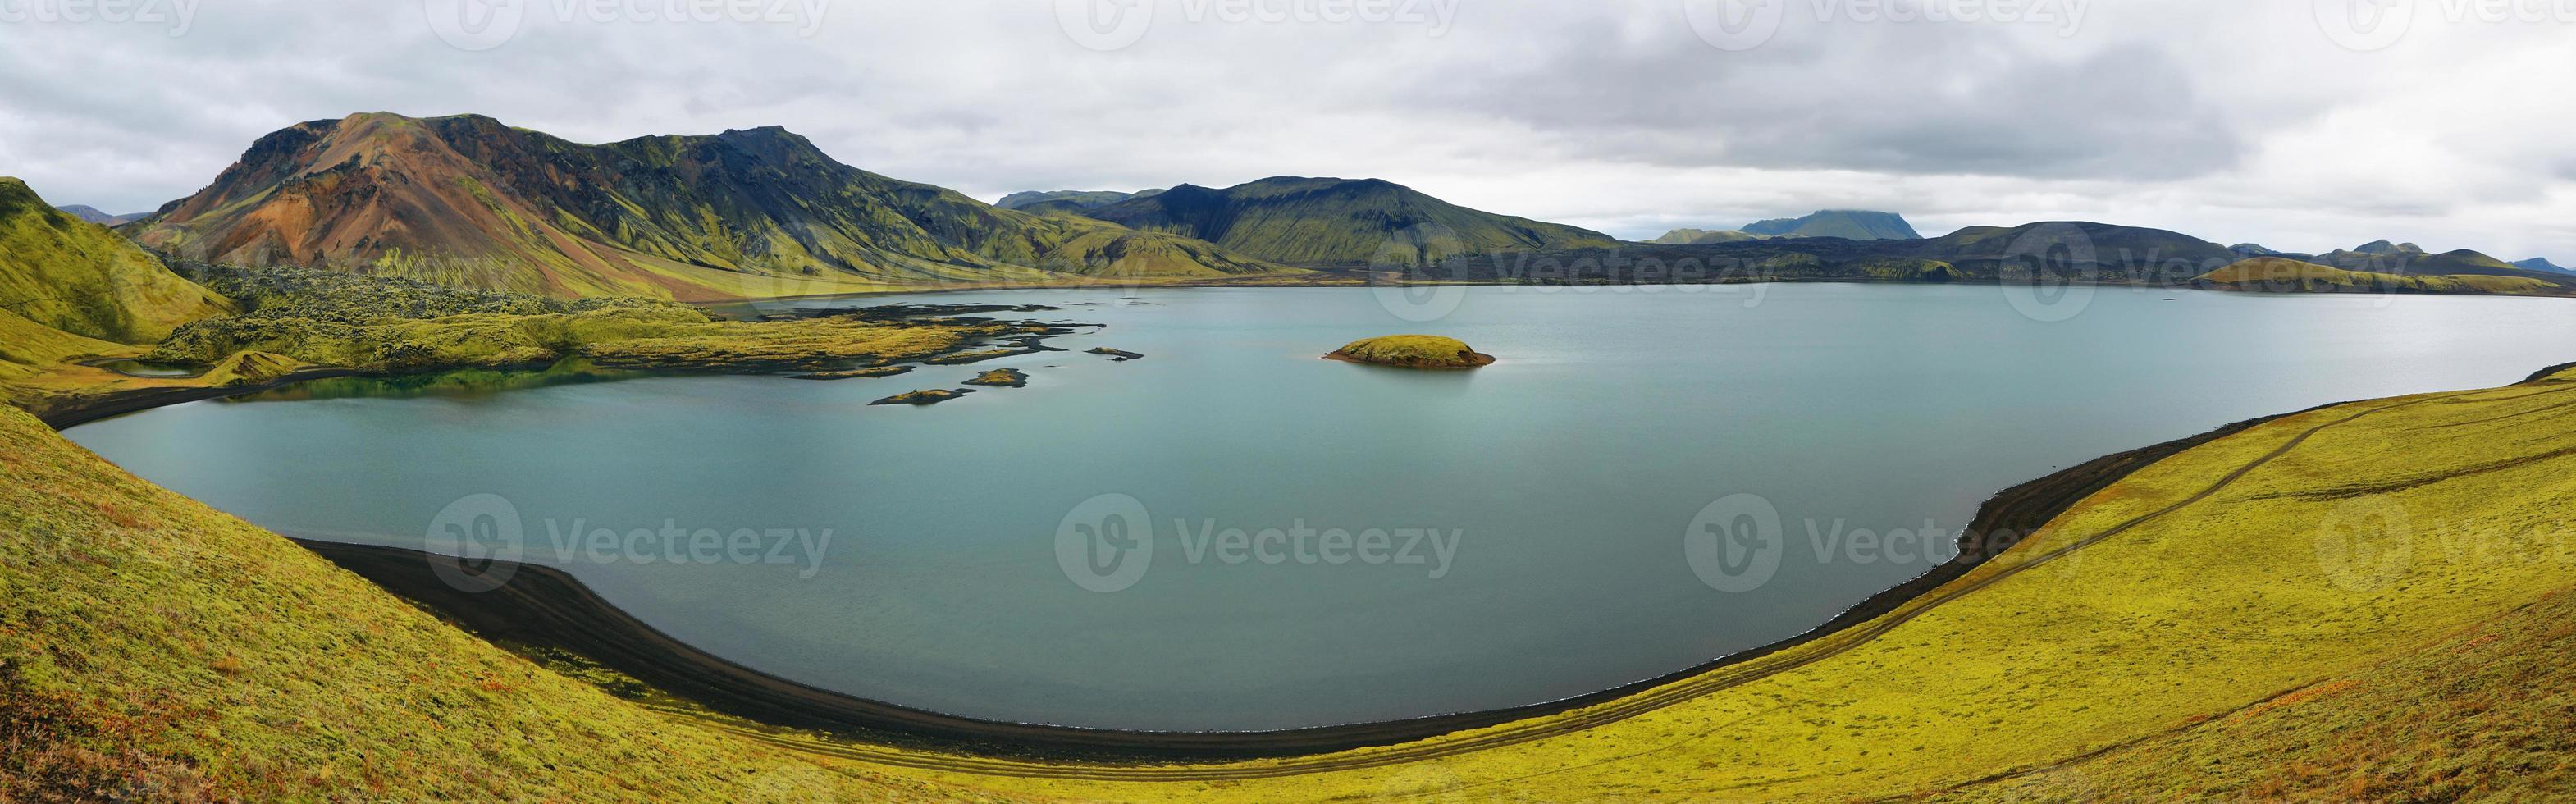 lago frostastadavatn foto